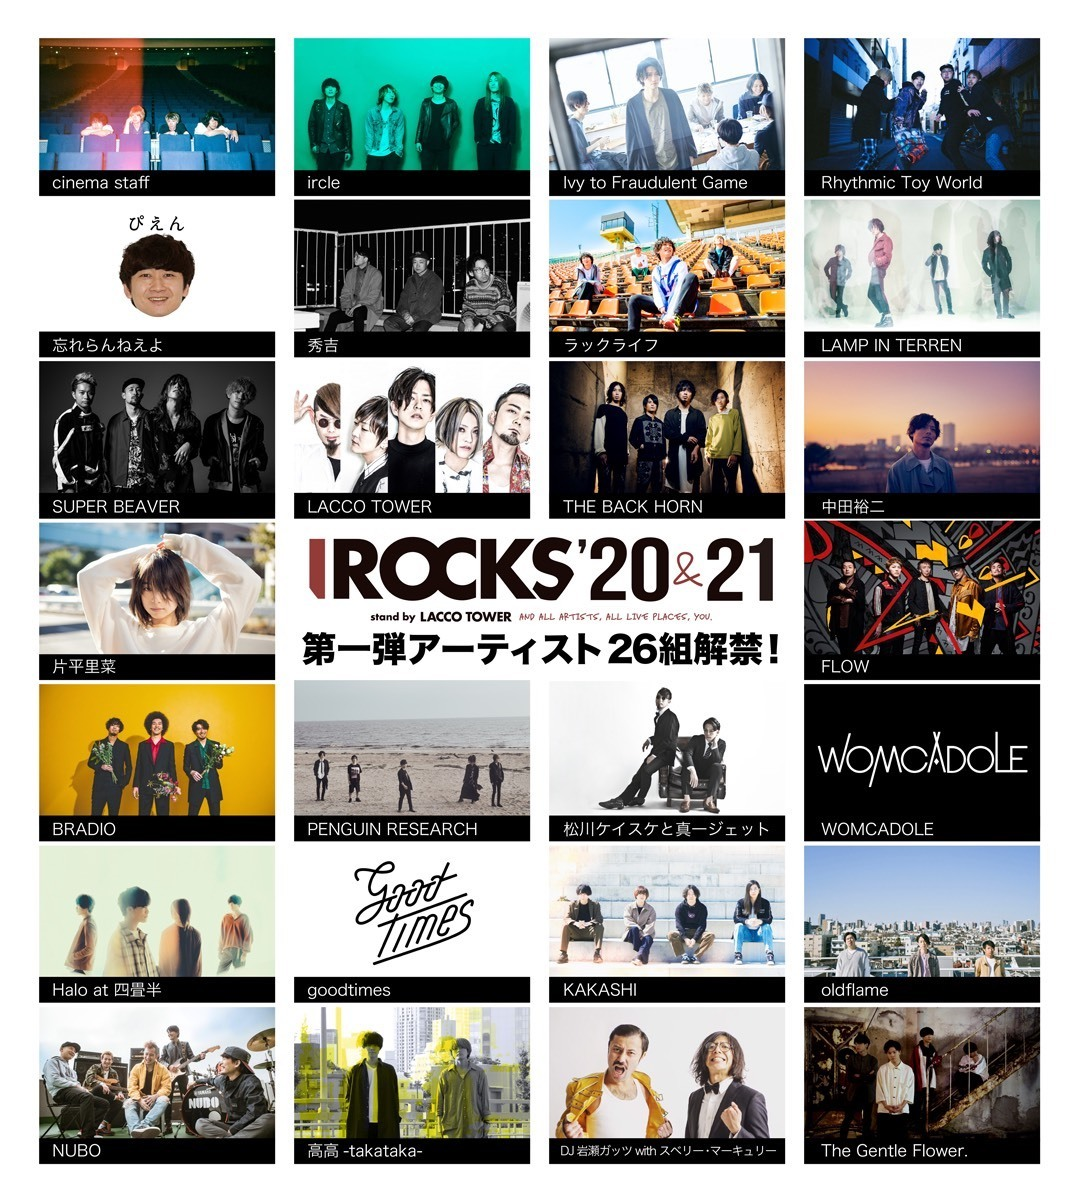 『I ROCKS 20&21』